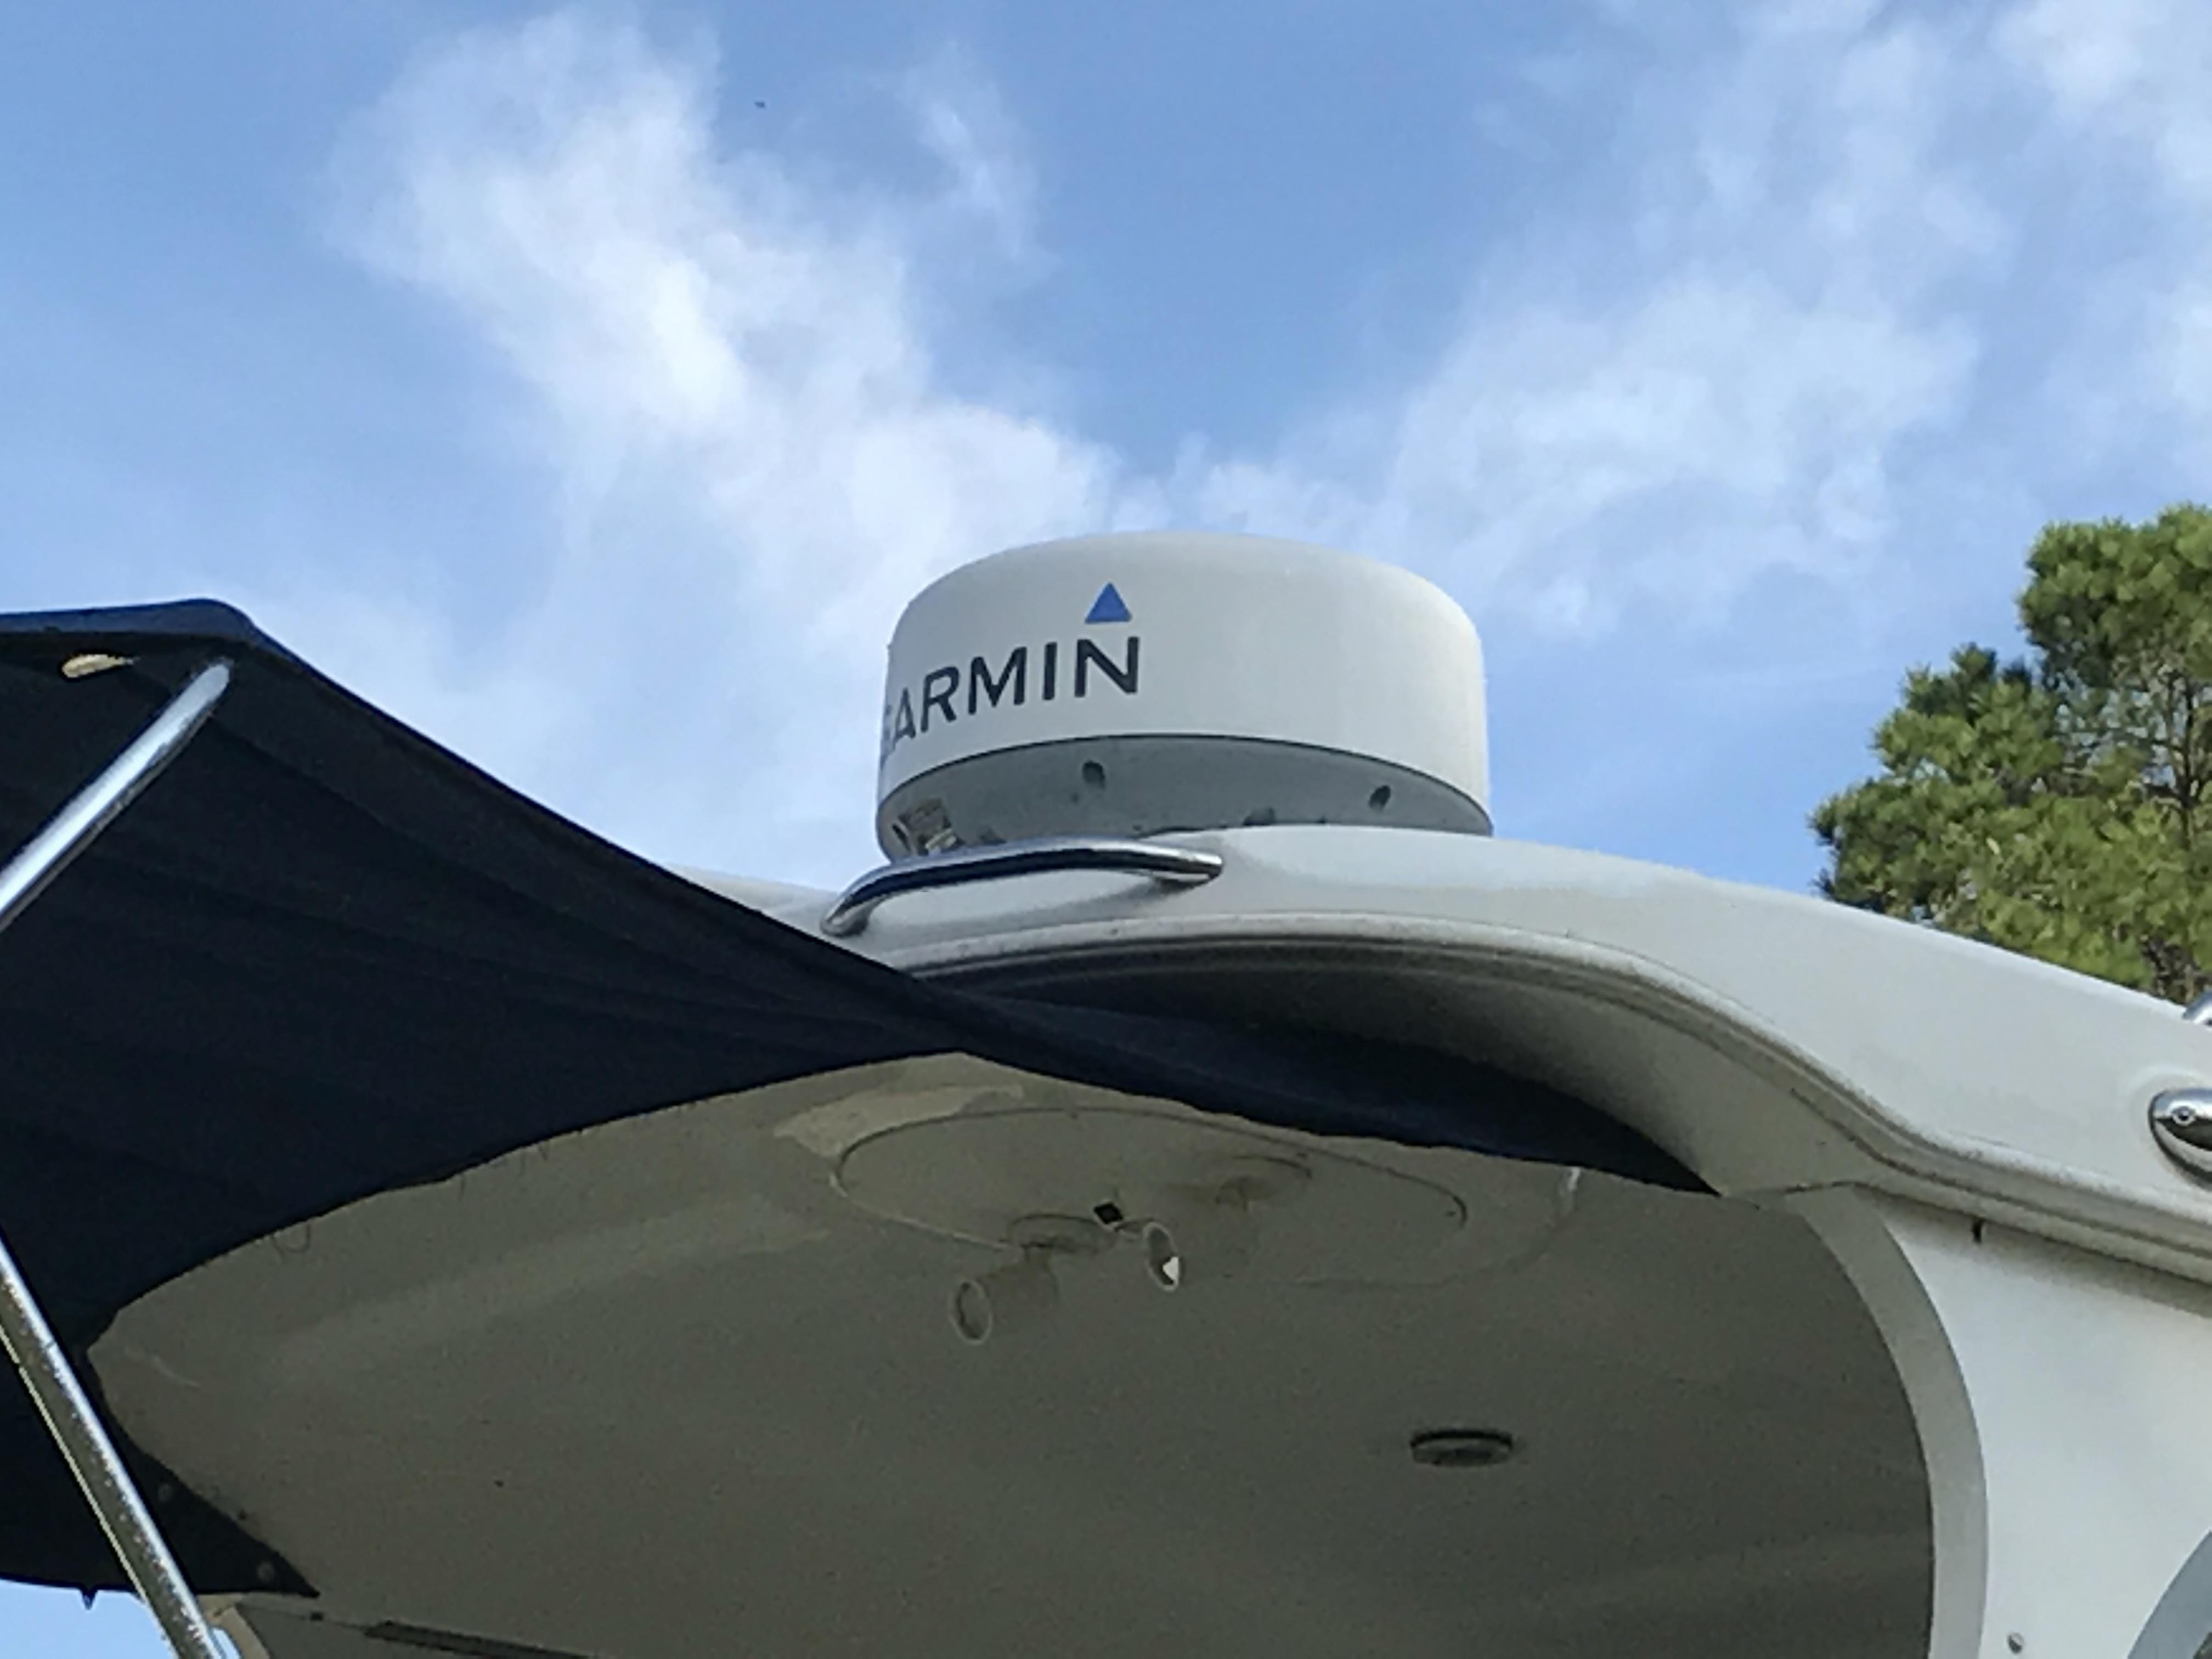 Bayliner Discovery 246 EC - Garmin RADAR and GPS